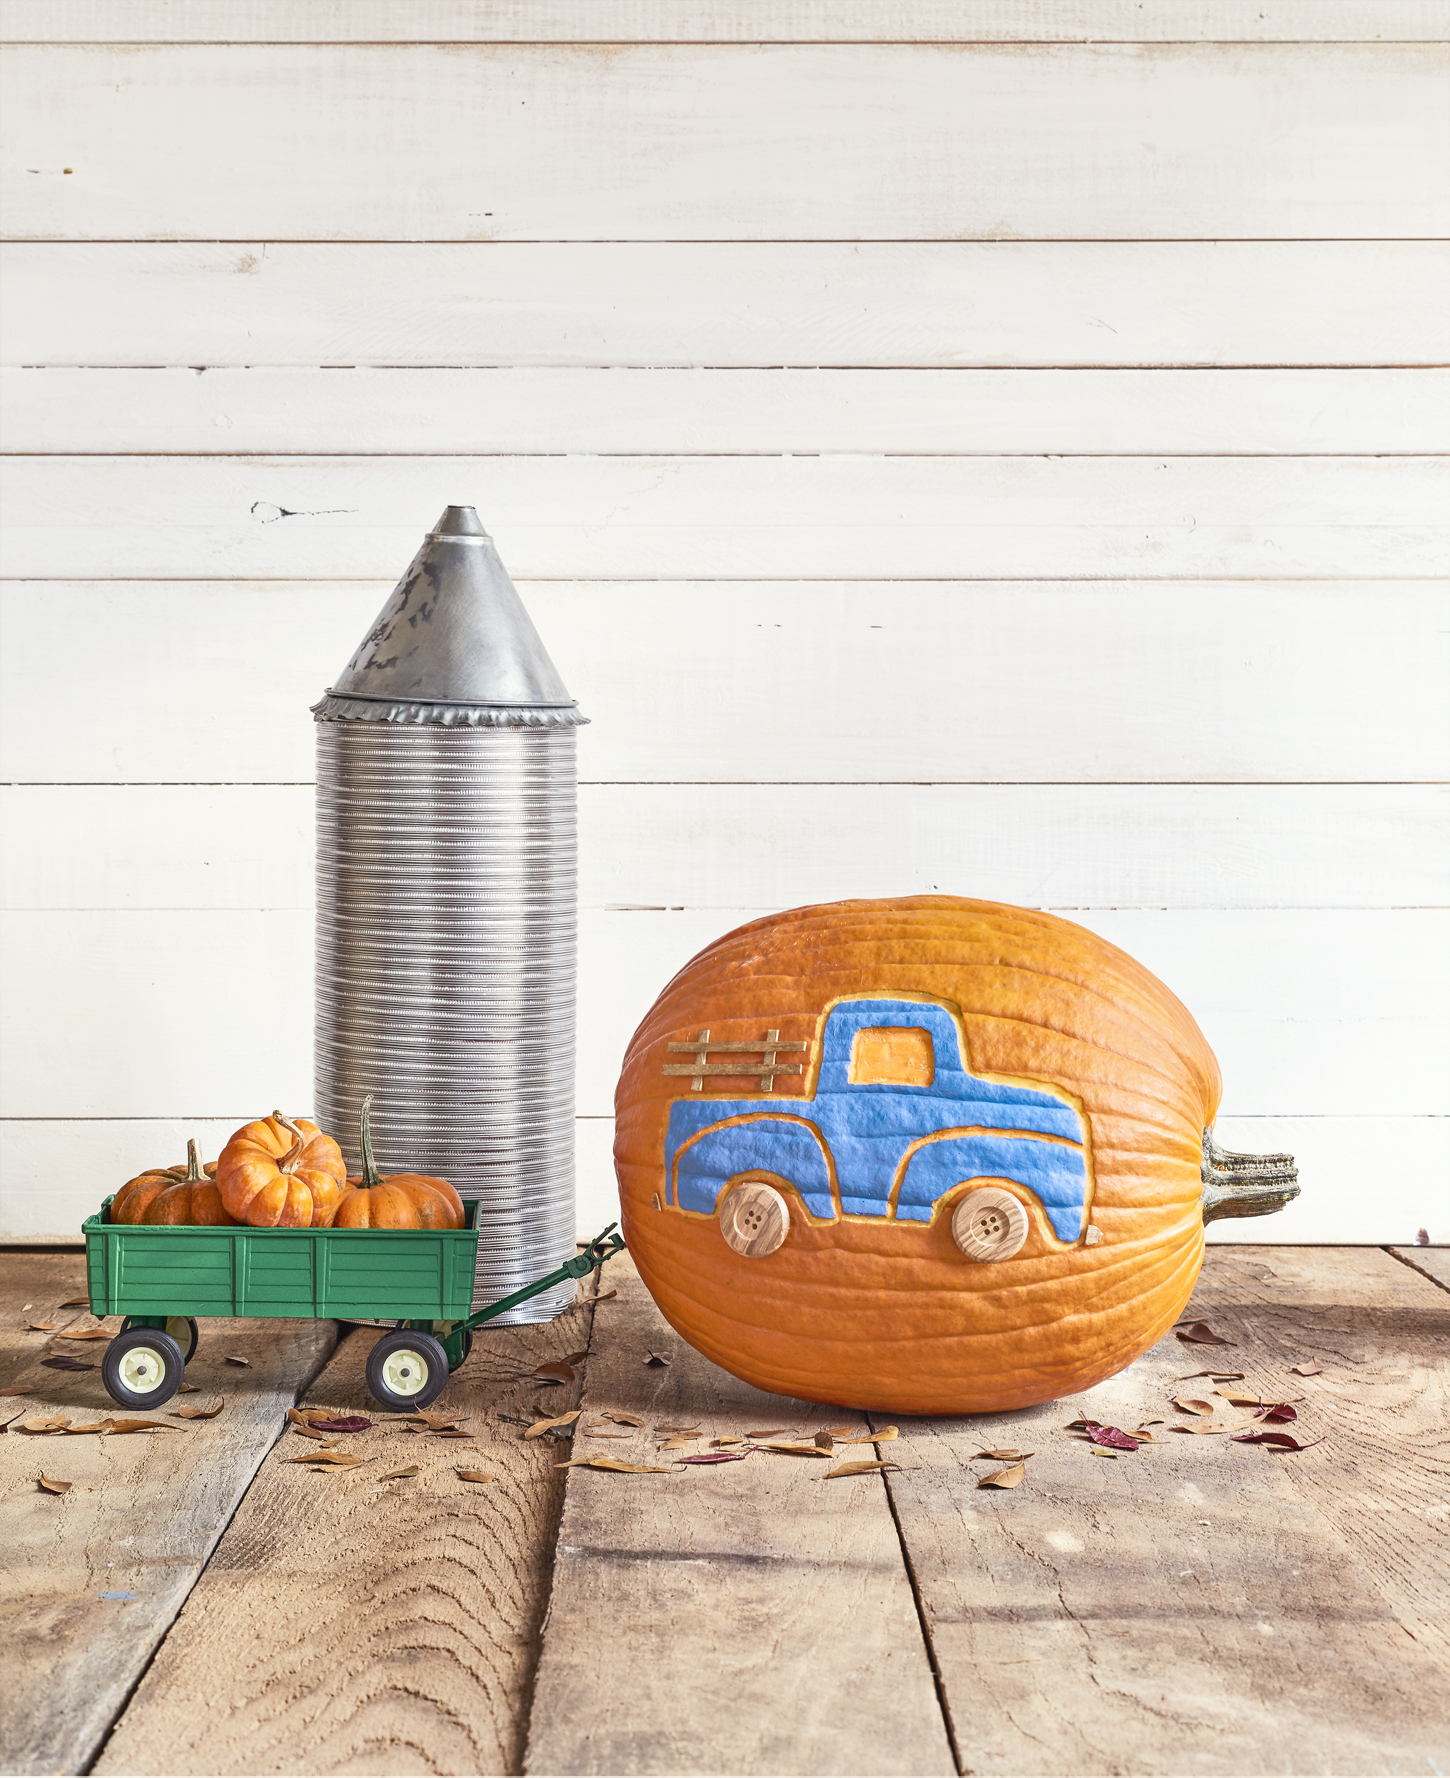 88 cool pumpkin decorating ideas easy halloween pumpkin decorations and crafts 2017